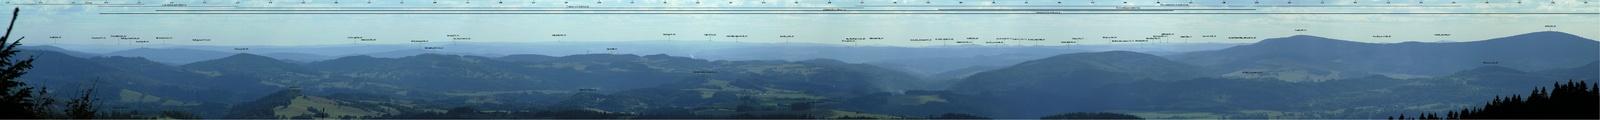 Travna-opis.thumb.jpg.f79943921911445db034945182e7e45a.jpg